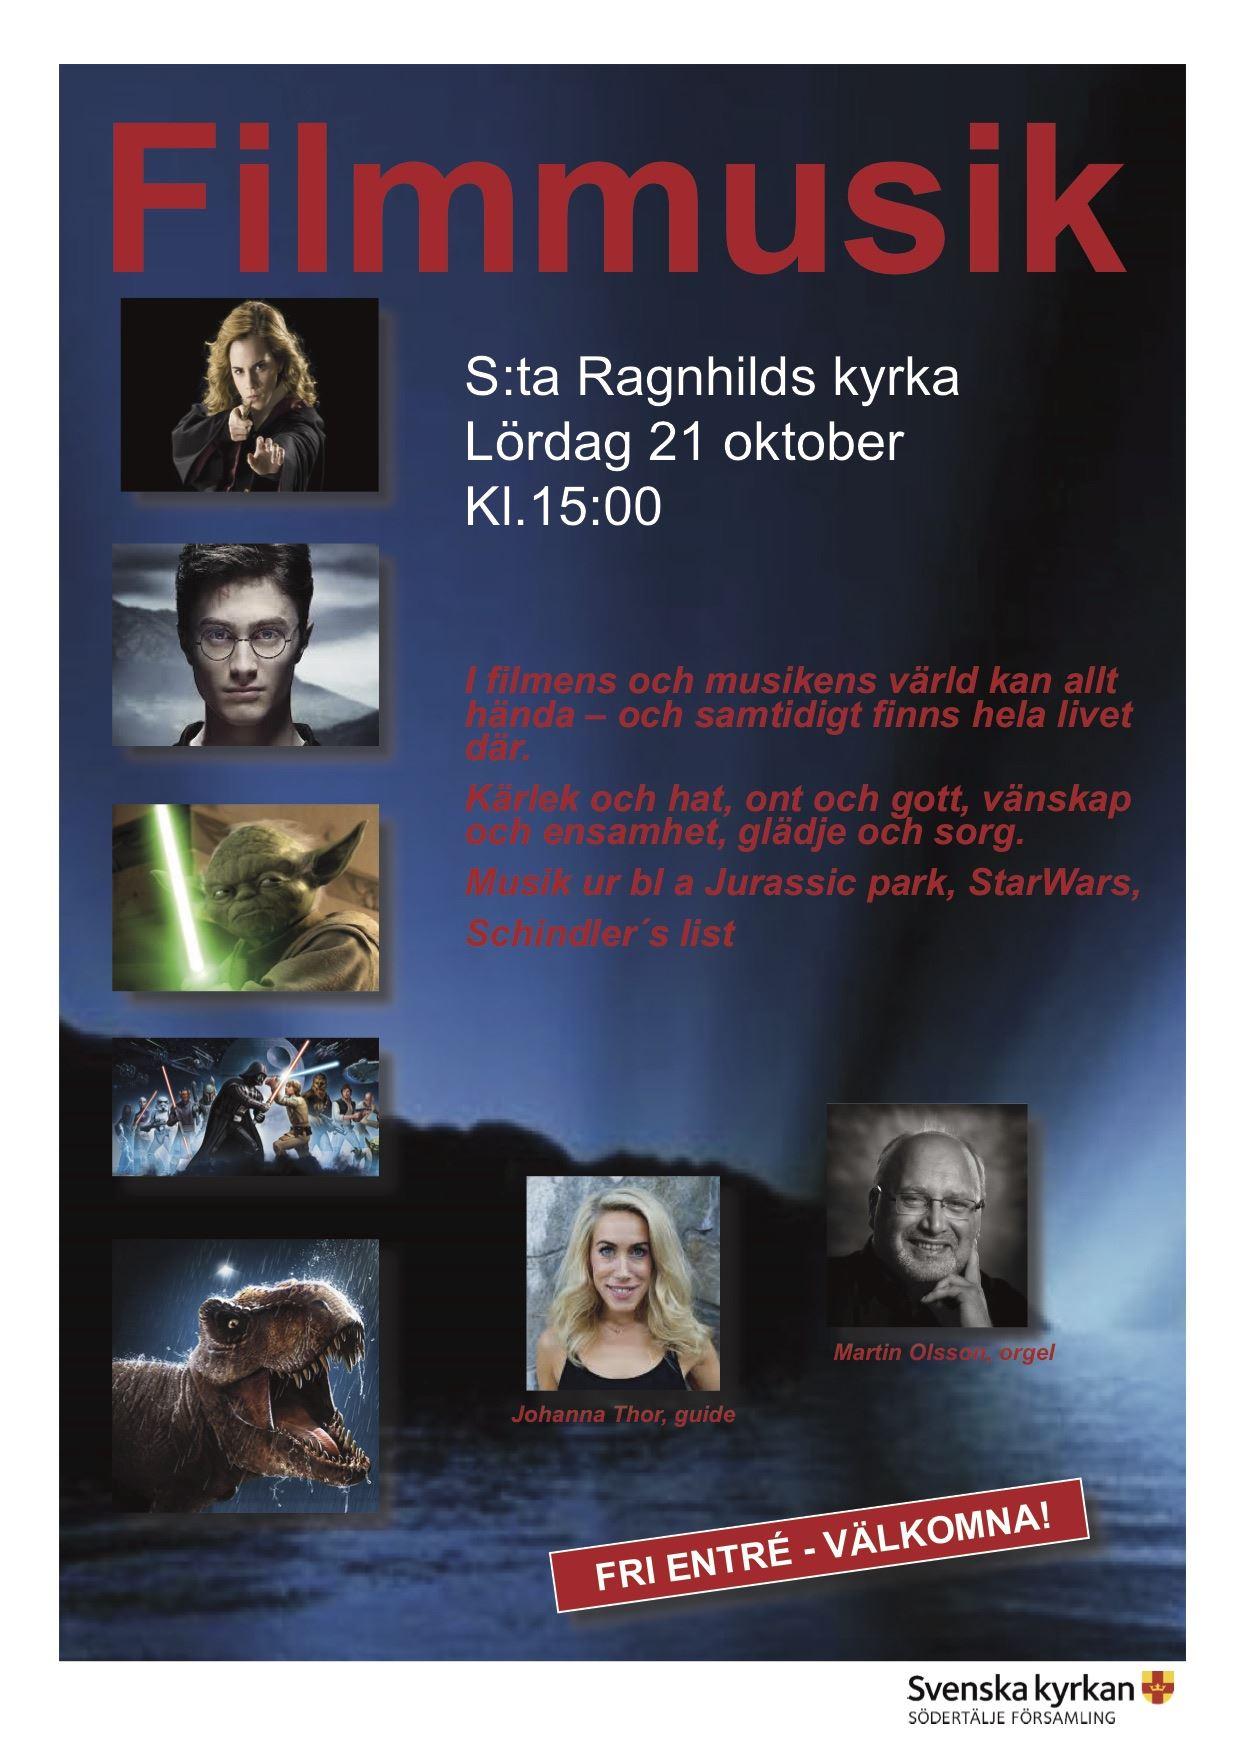 Filmmusik i S:ta Ragnhilds kyrka